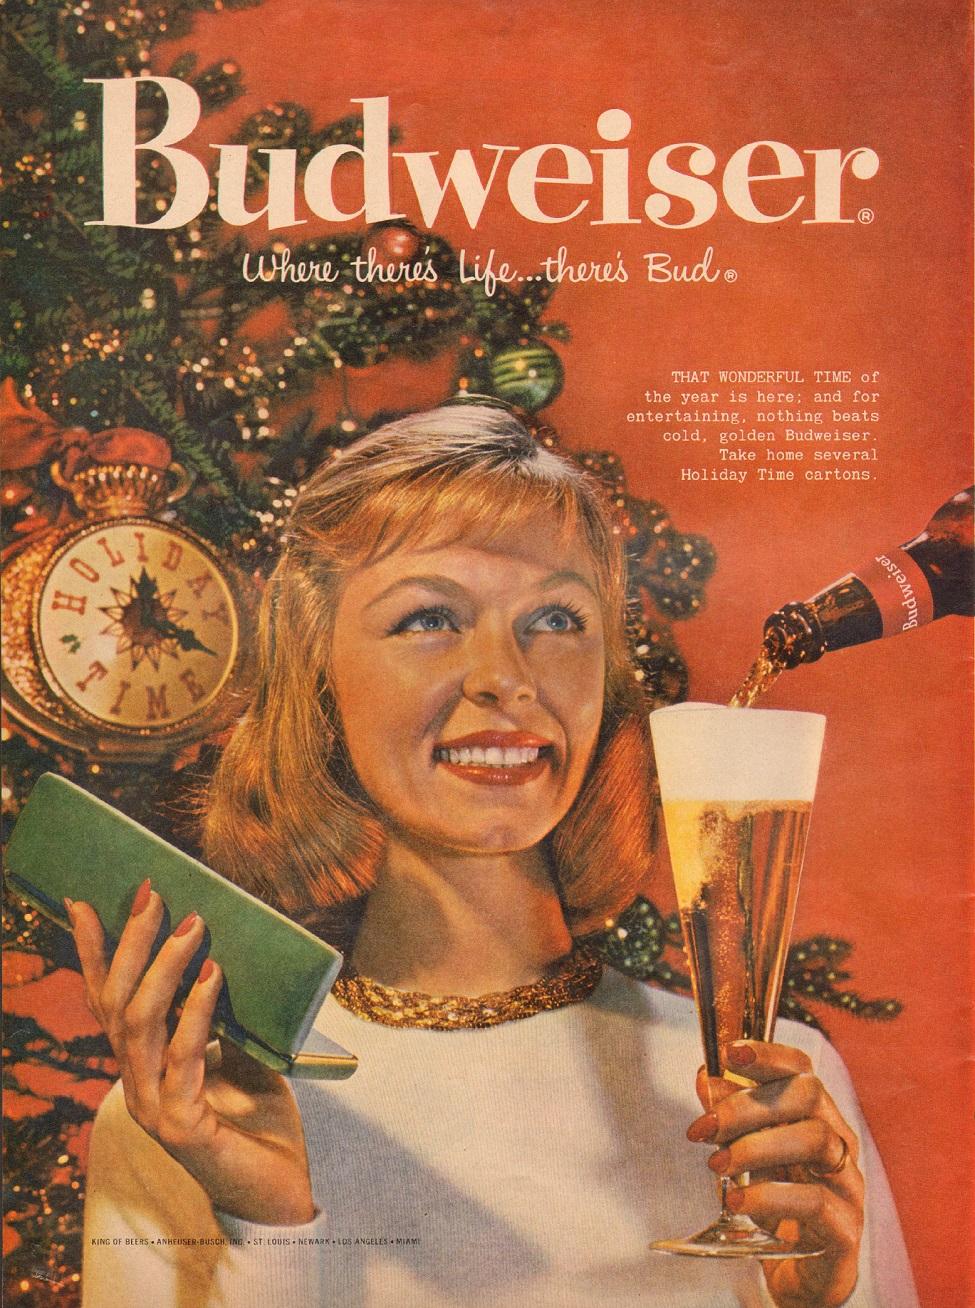 BUDWEISER BEER LIFE 12/08/1958 p. 114